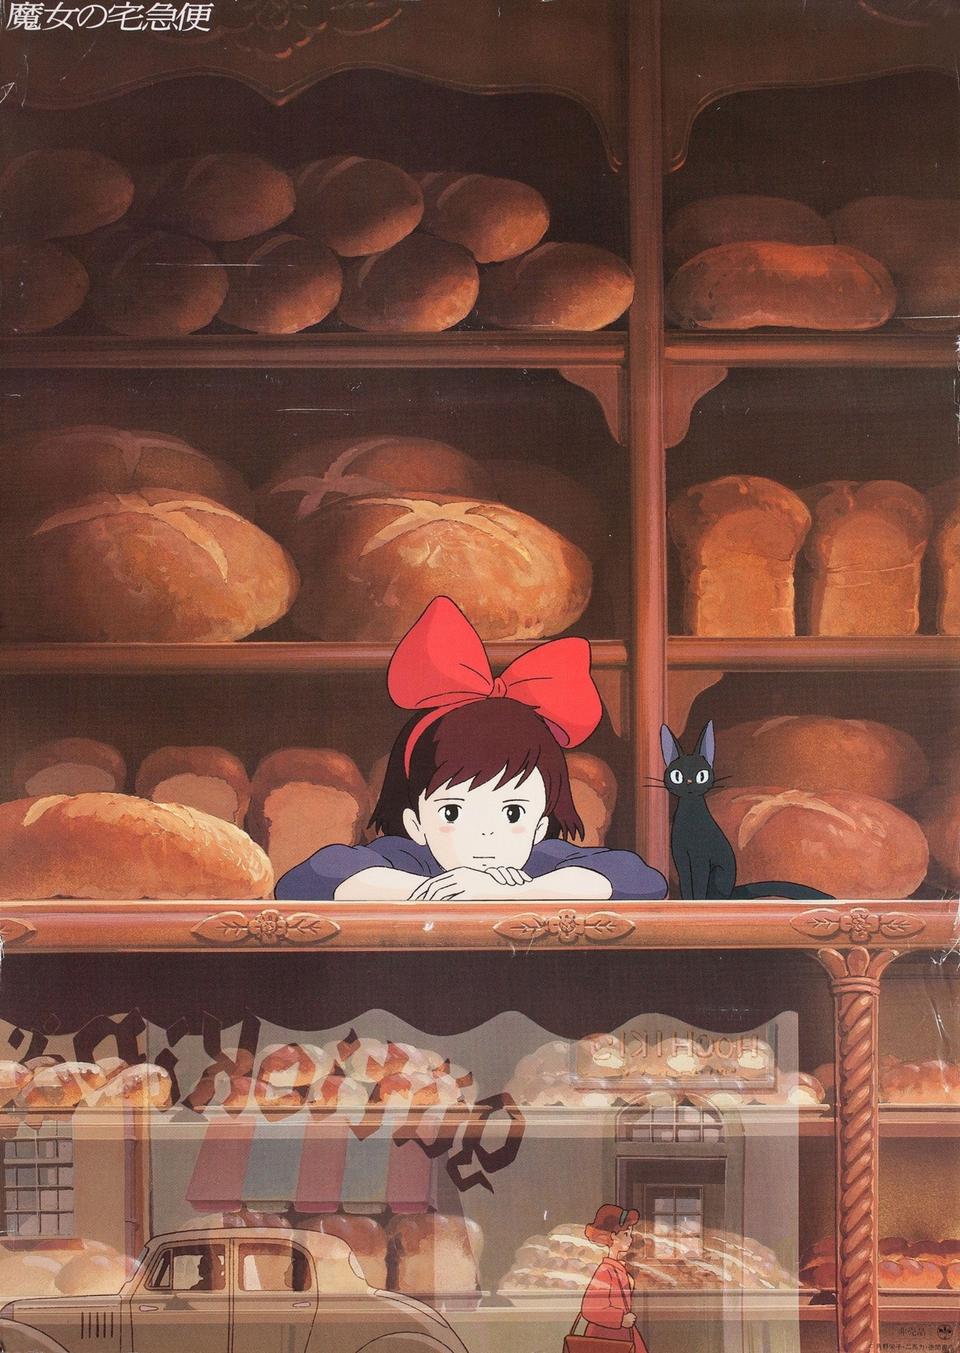 Kiki's Delivery Service (1989) [1800 × 2537] Japanese poster